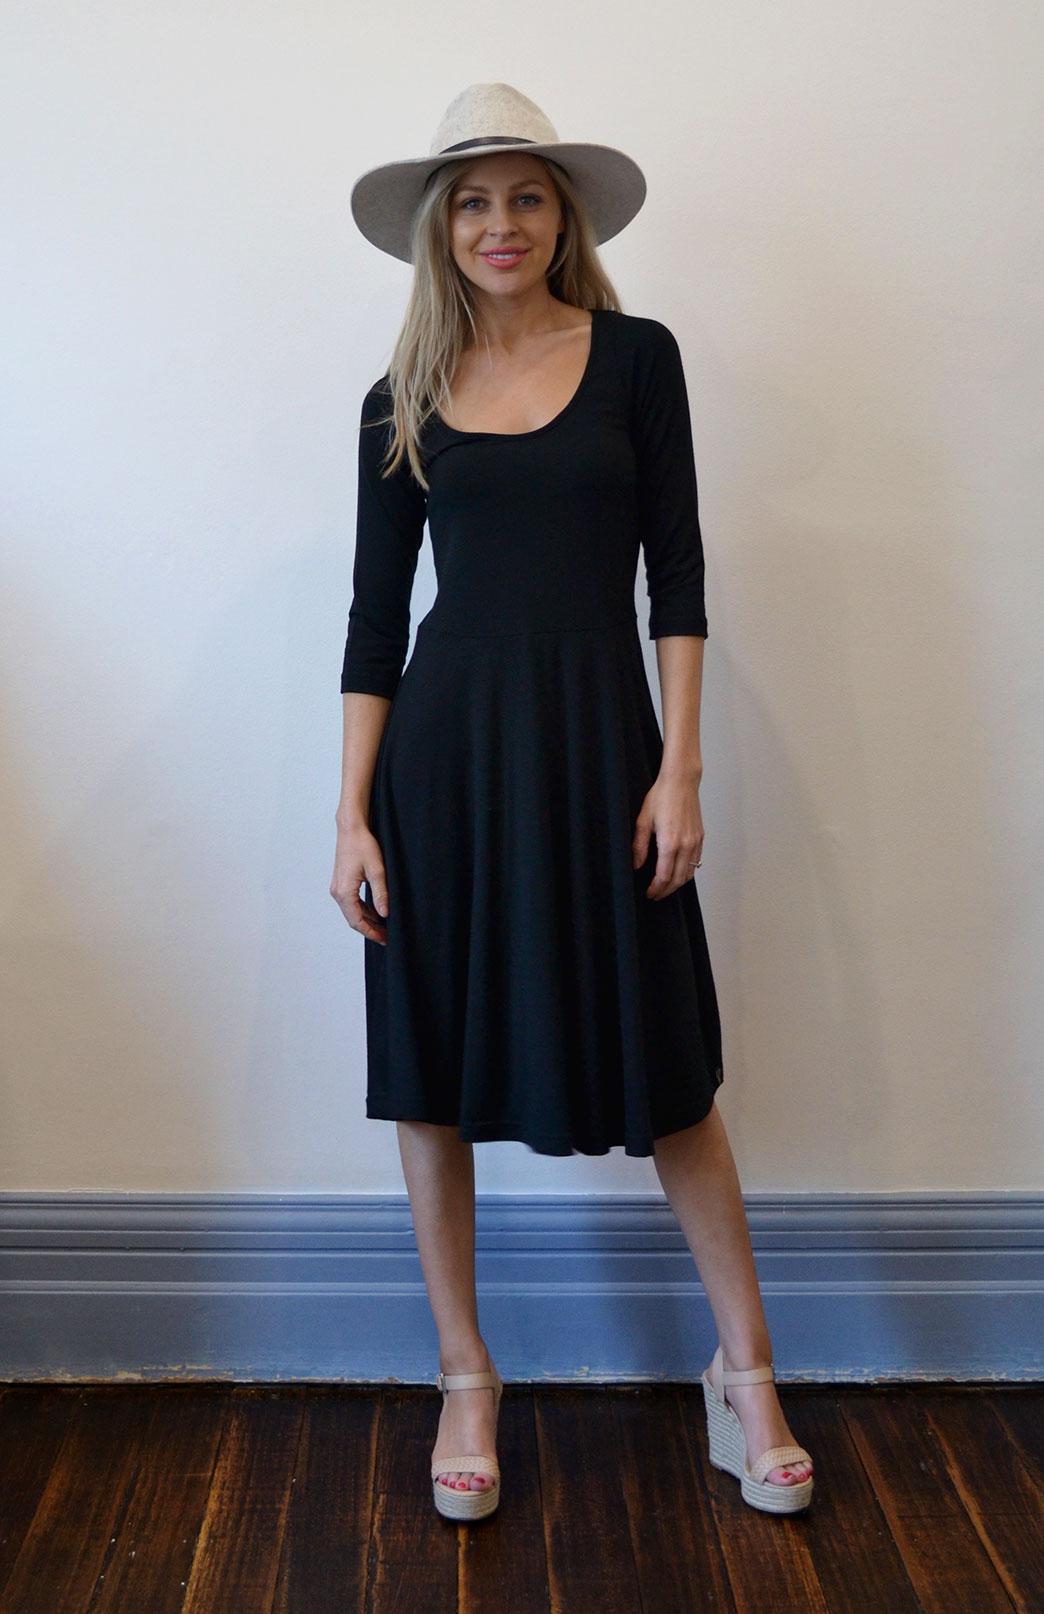 3/4 Jackie Dress - Women's Black Merino Wool 3/4 Sleeve Jackie Dress - Smitten Merino Tasmania Australia